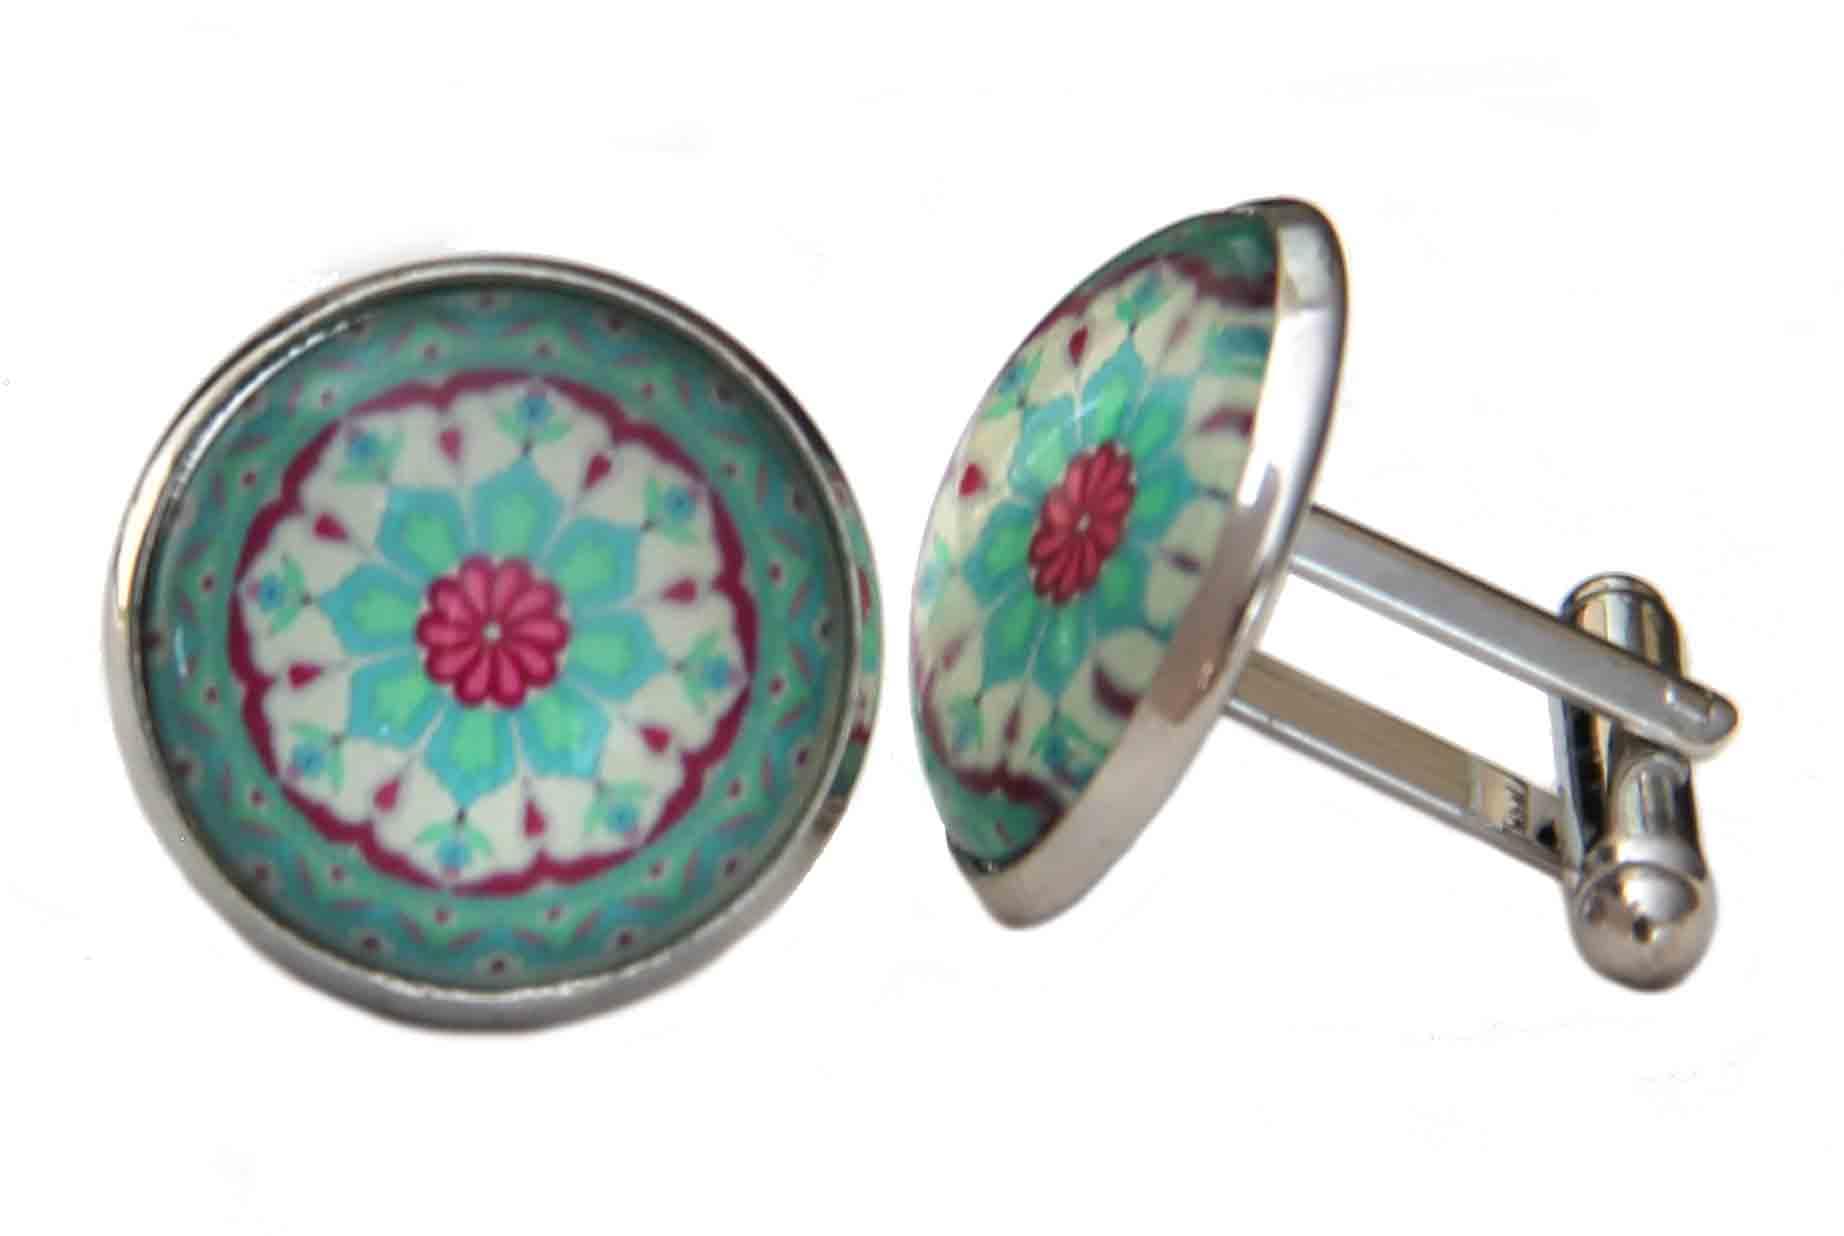 Gascoigne Cufflinks Floral Pattern Silver Metal Alloy Pink Green White Men's